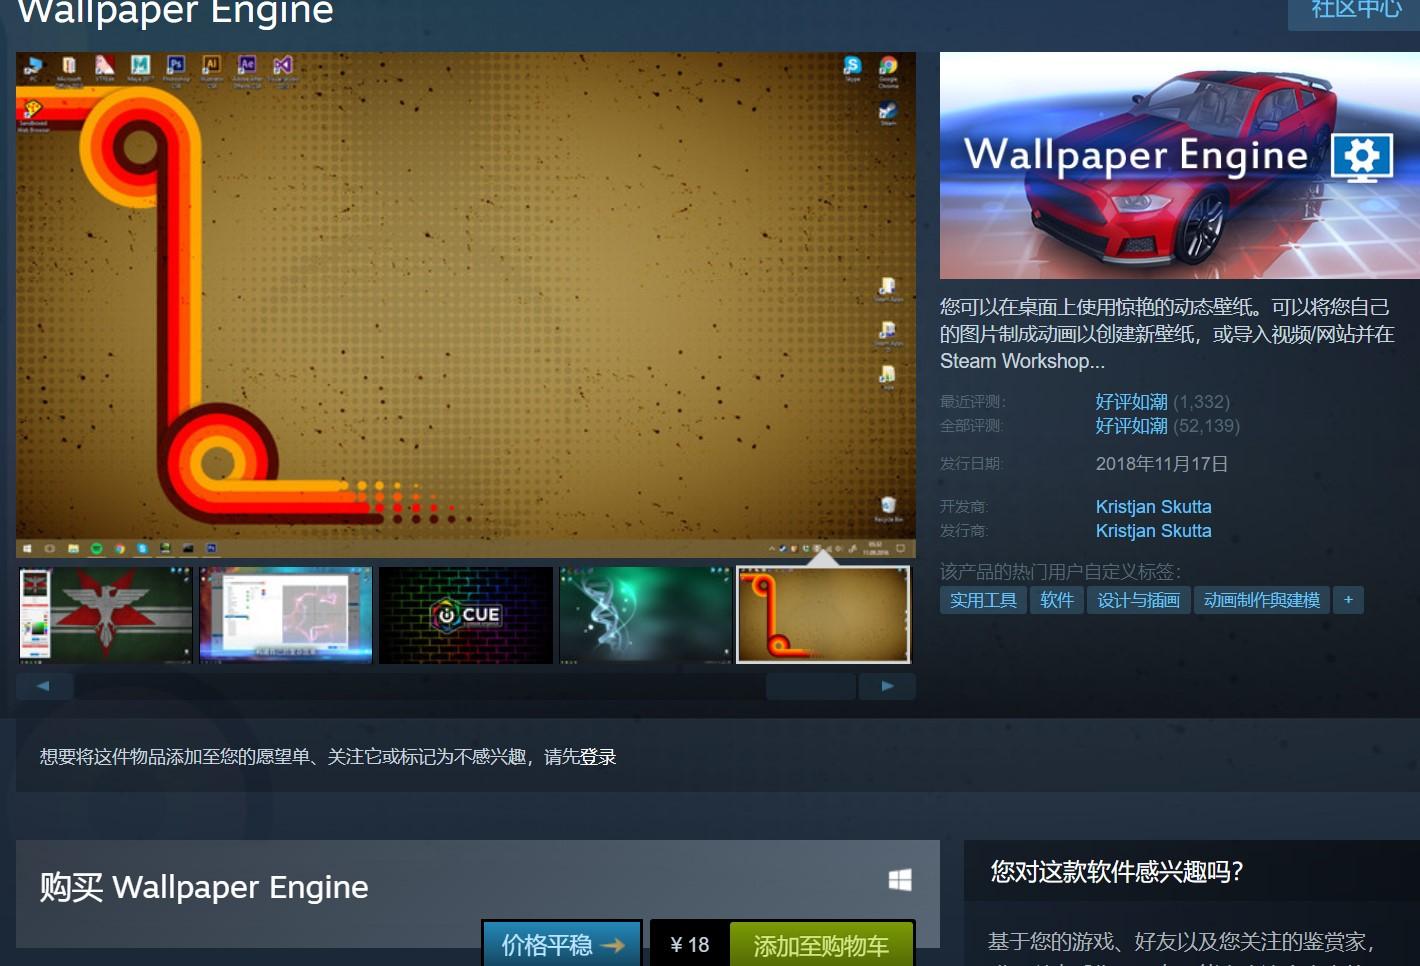 Wallpaper Engine正式版在Steam发售 国区18元